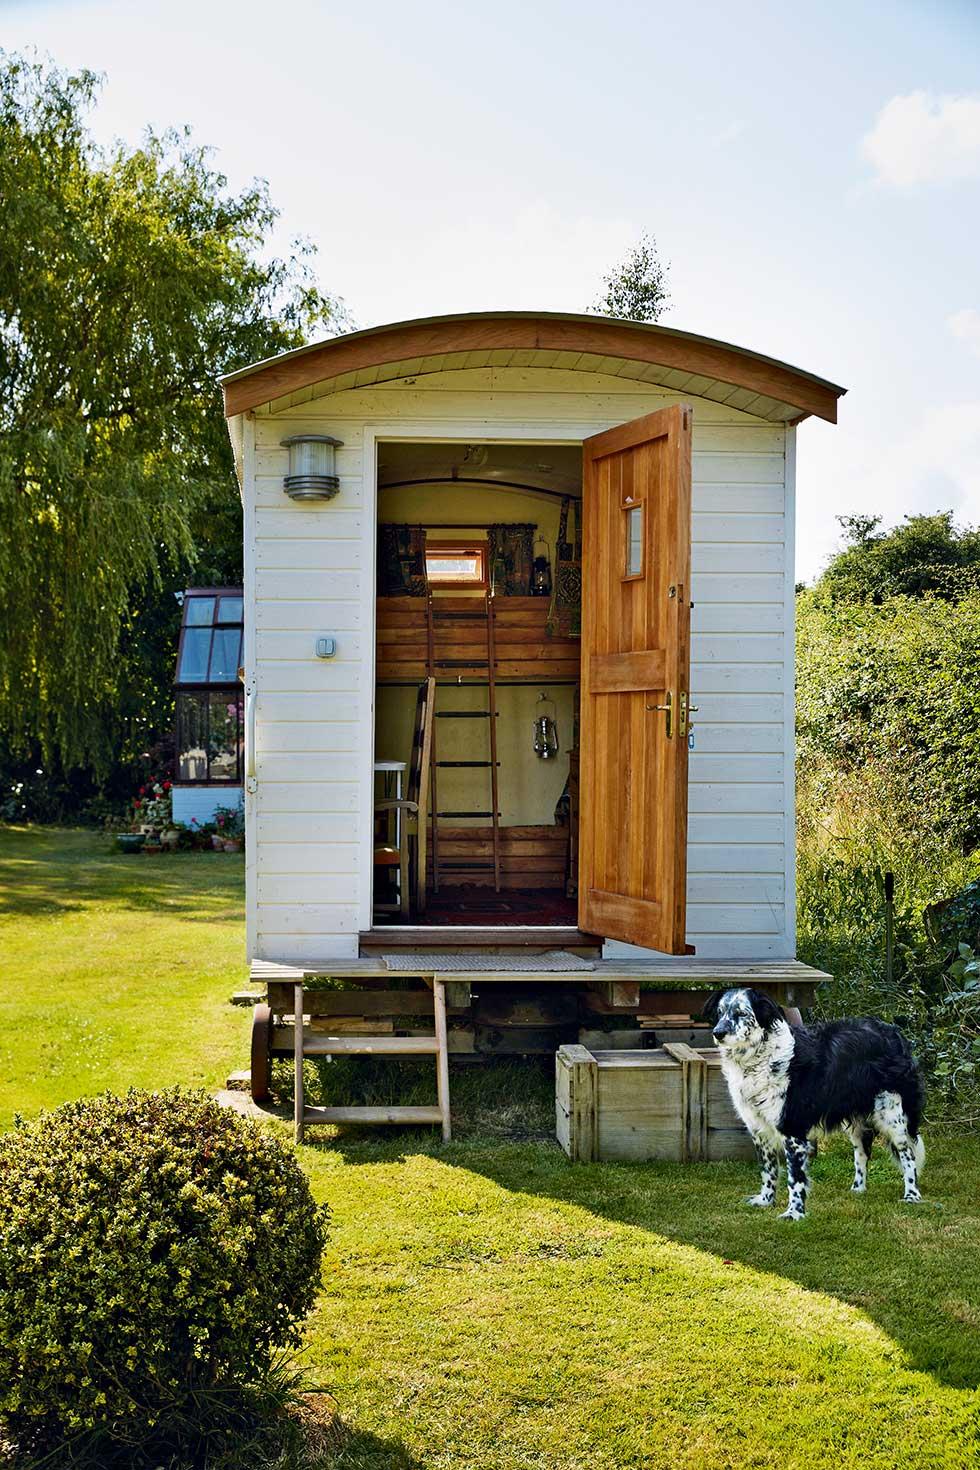 davies-self-build-shepards-hut